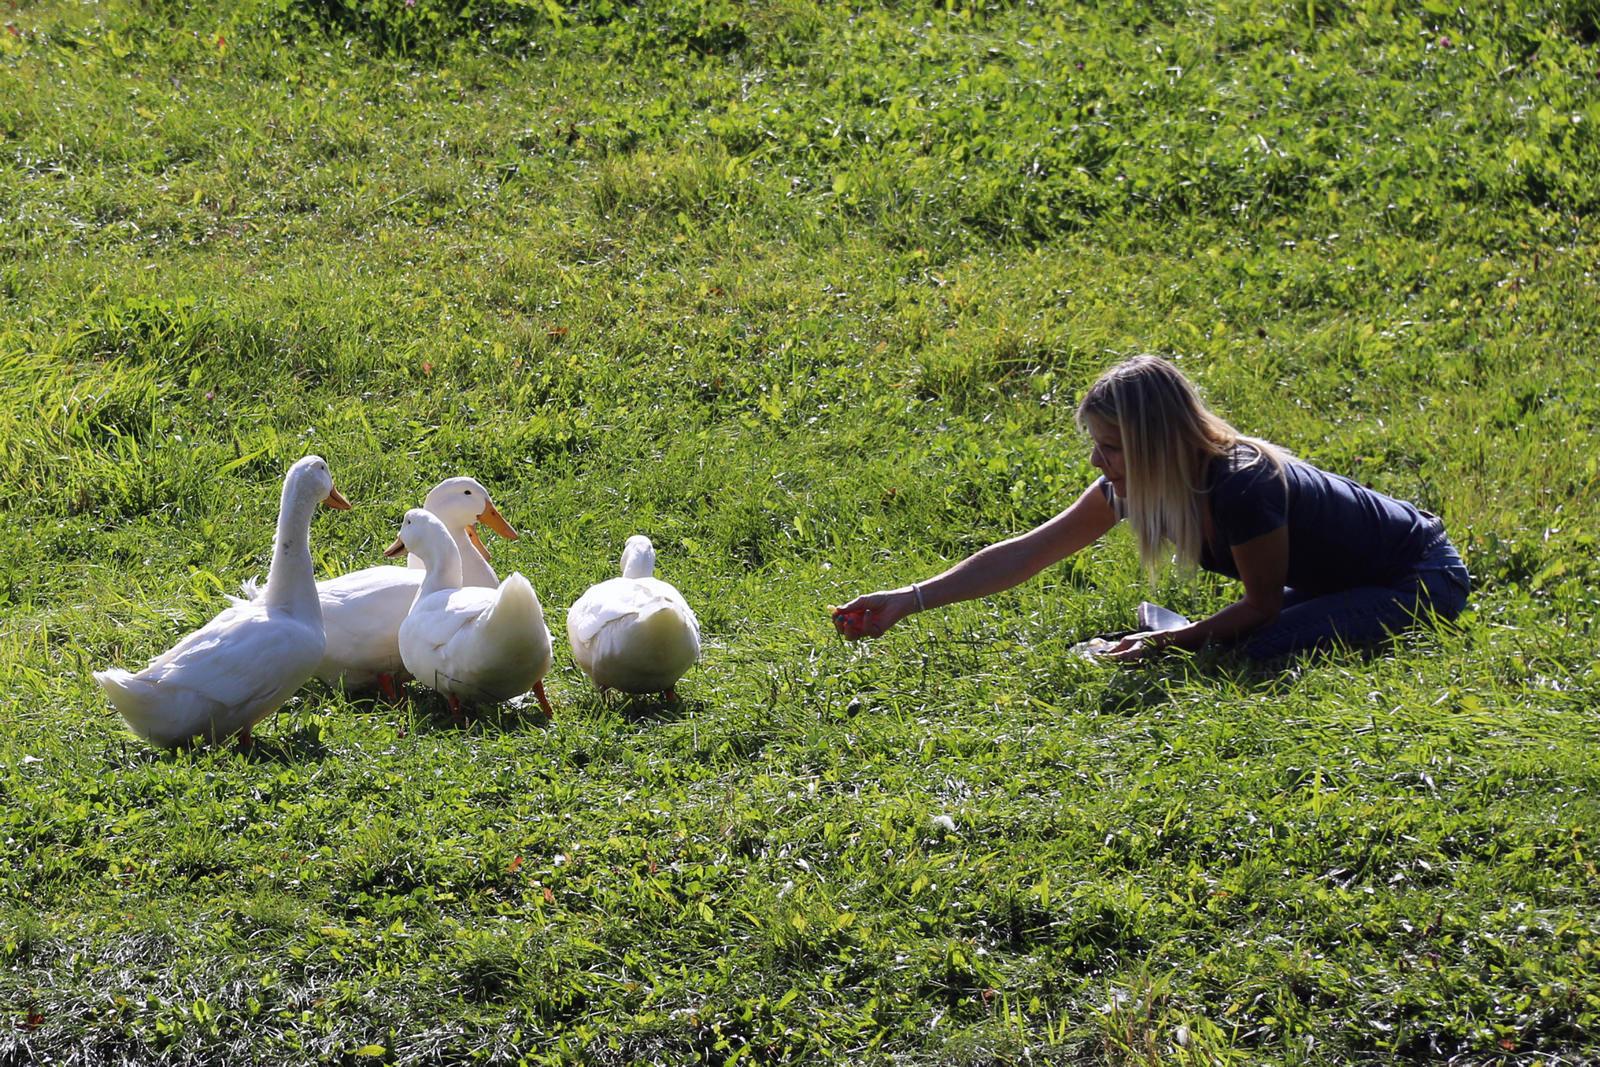 girl feeding four white ducks